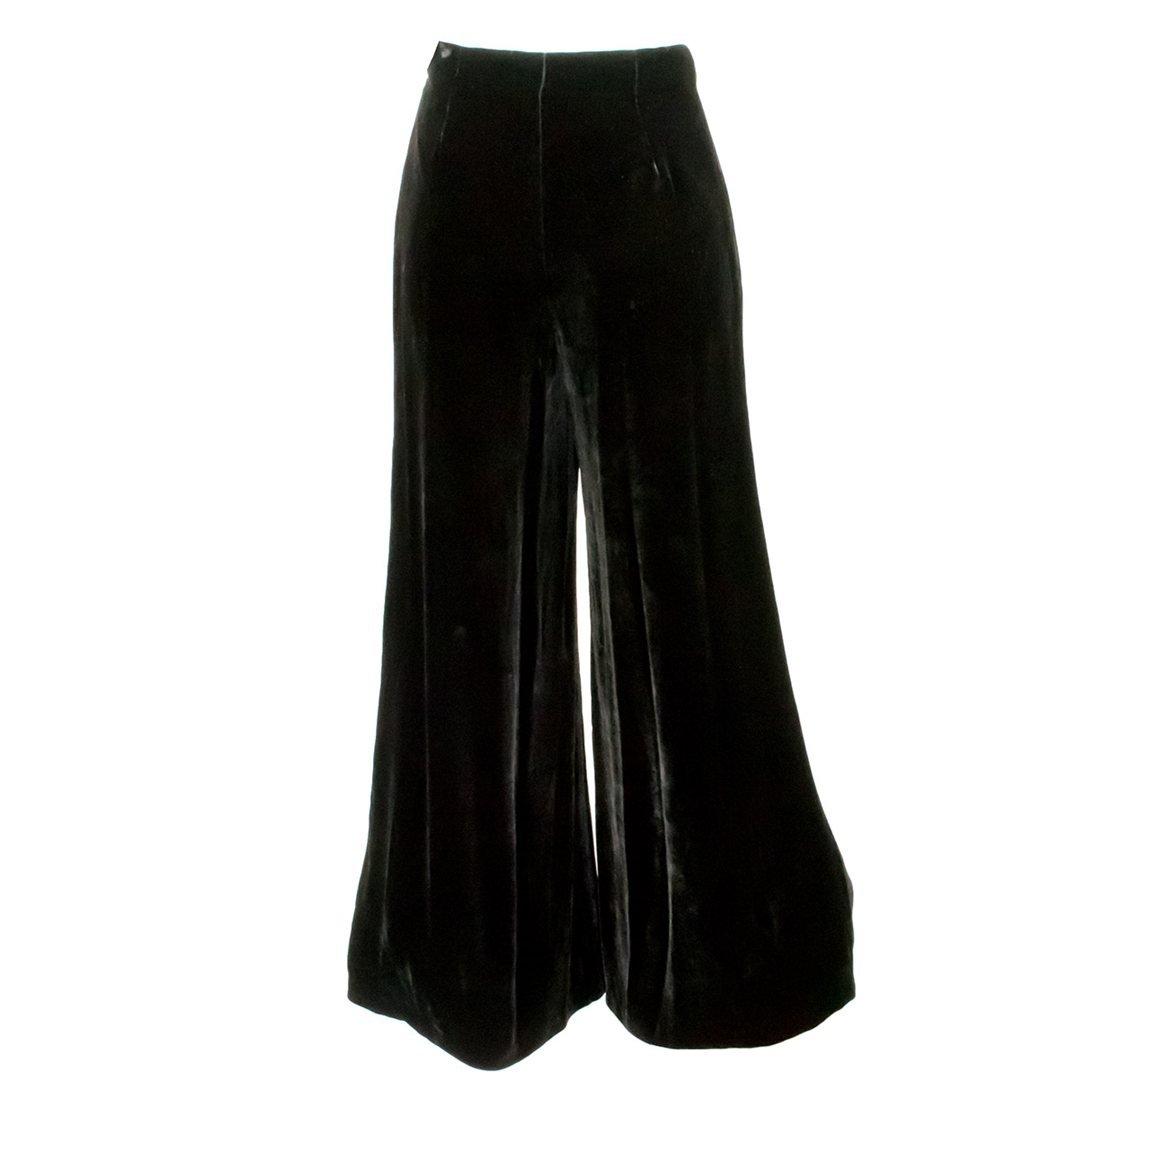 Palazzo Party Pants Black 8